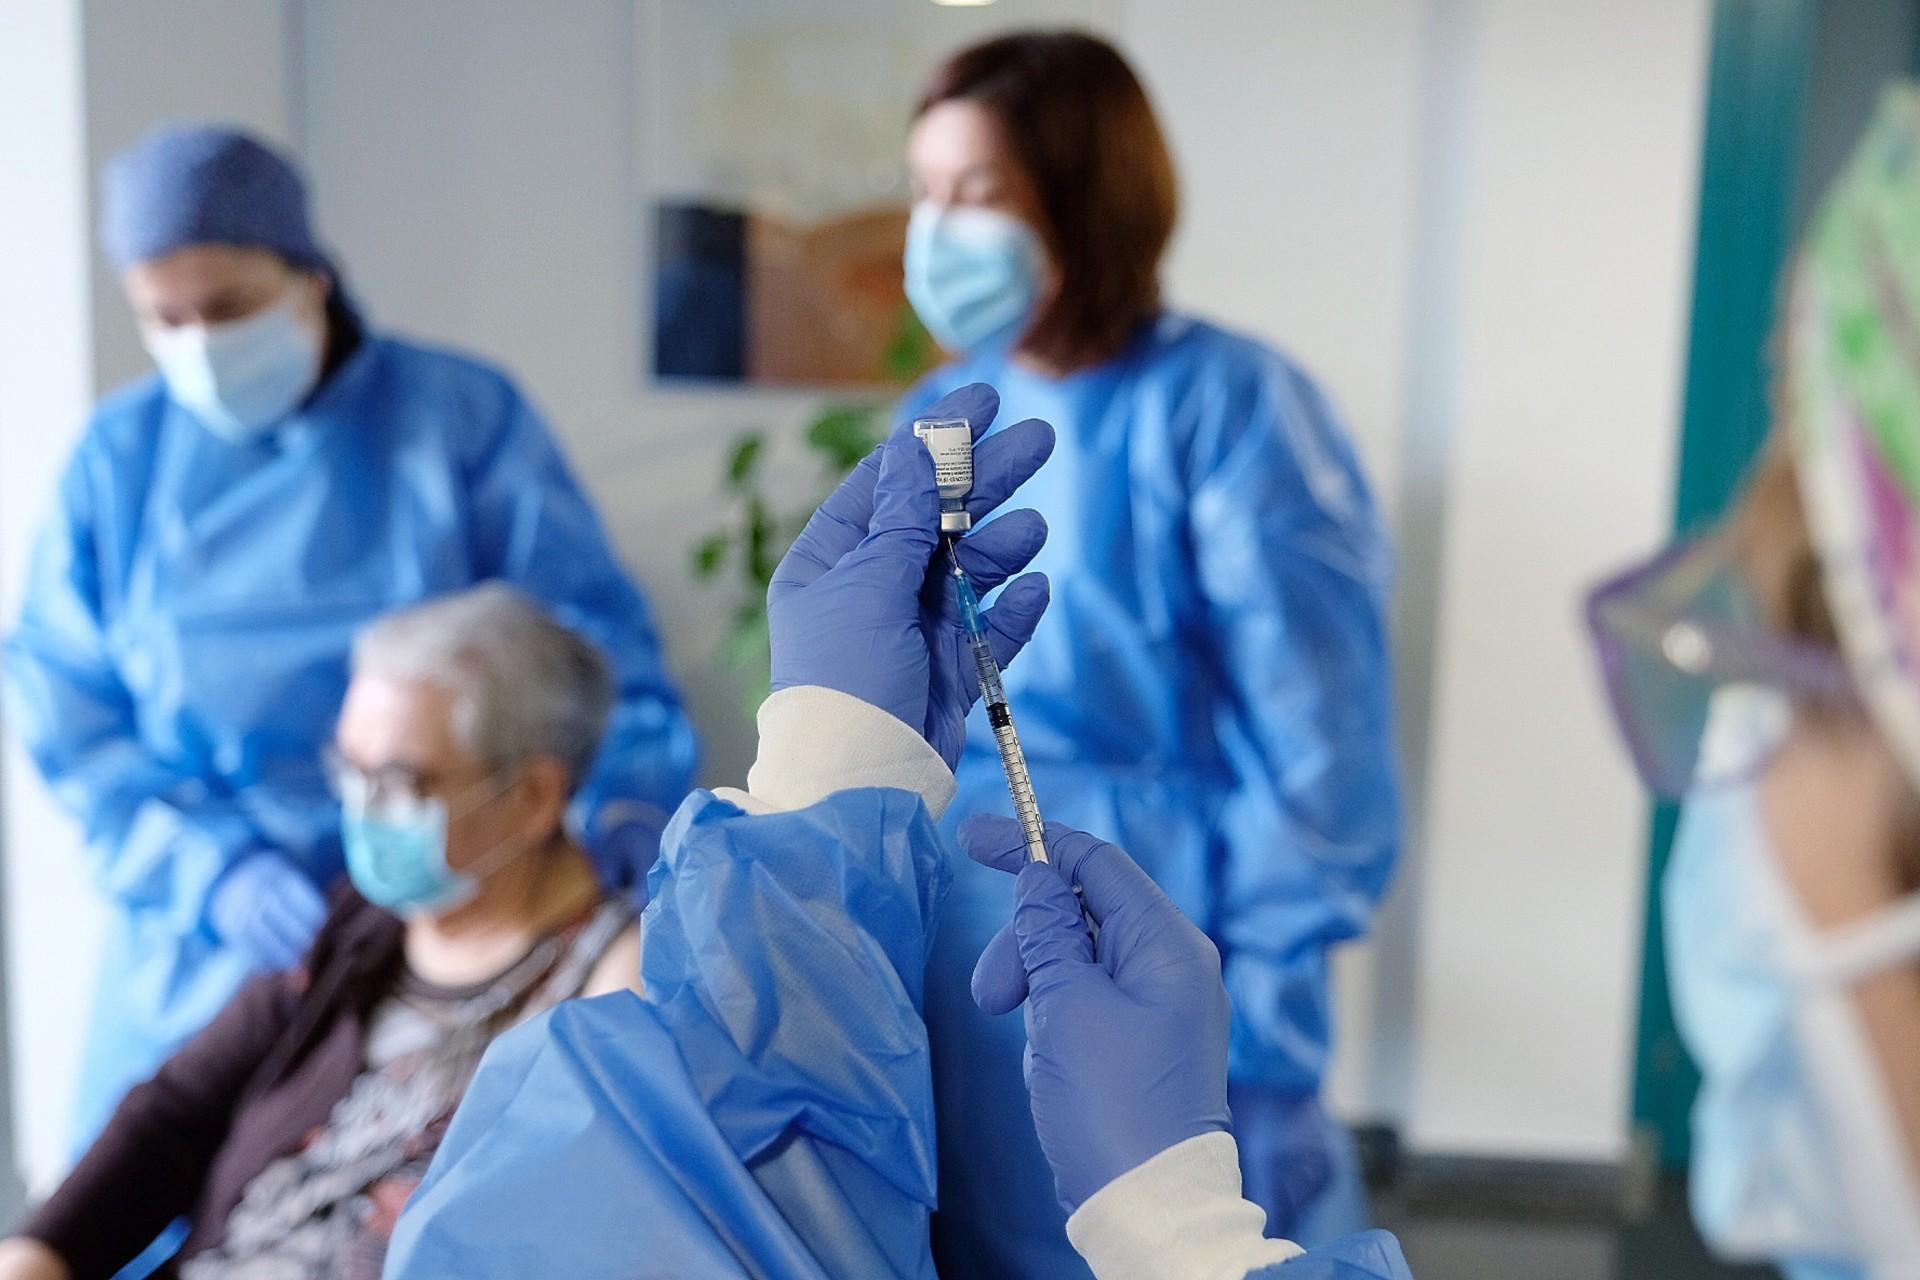 Segona dosi vacuna Pzifer Feixa Llarga a L'Hospitalet